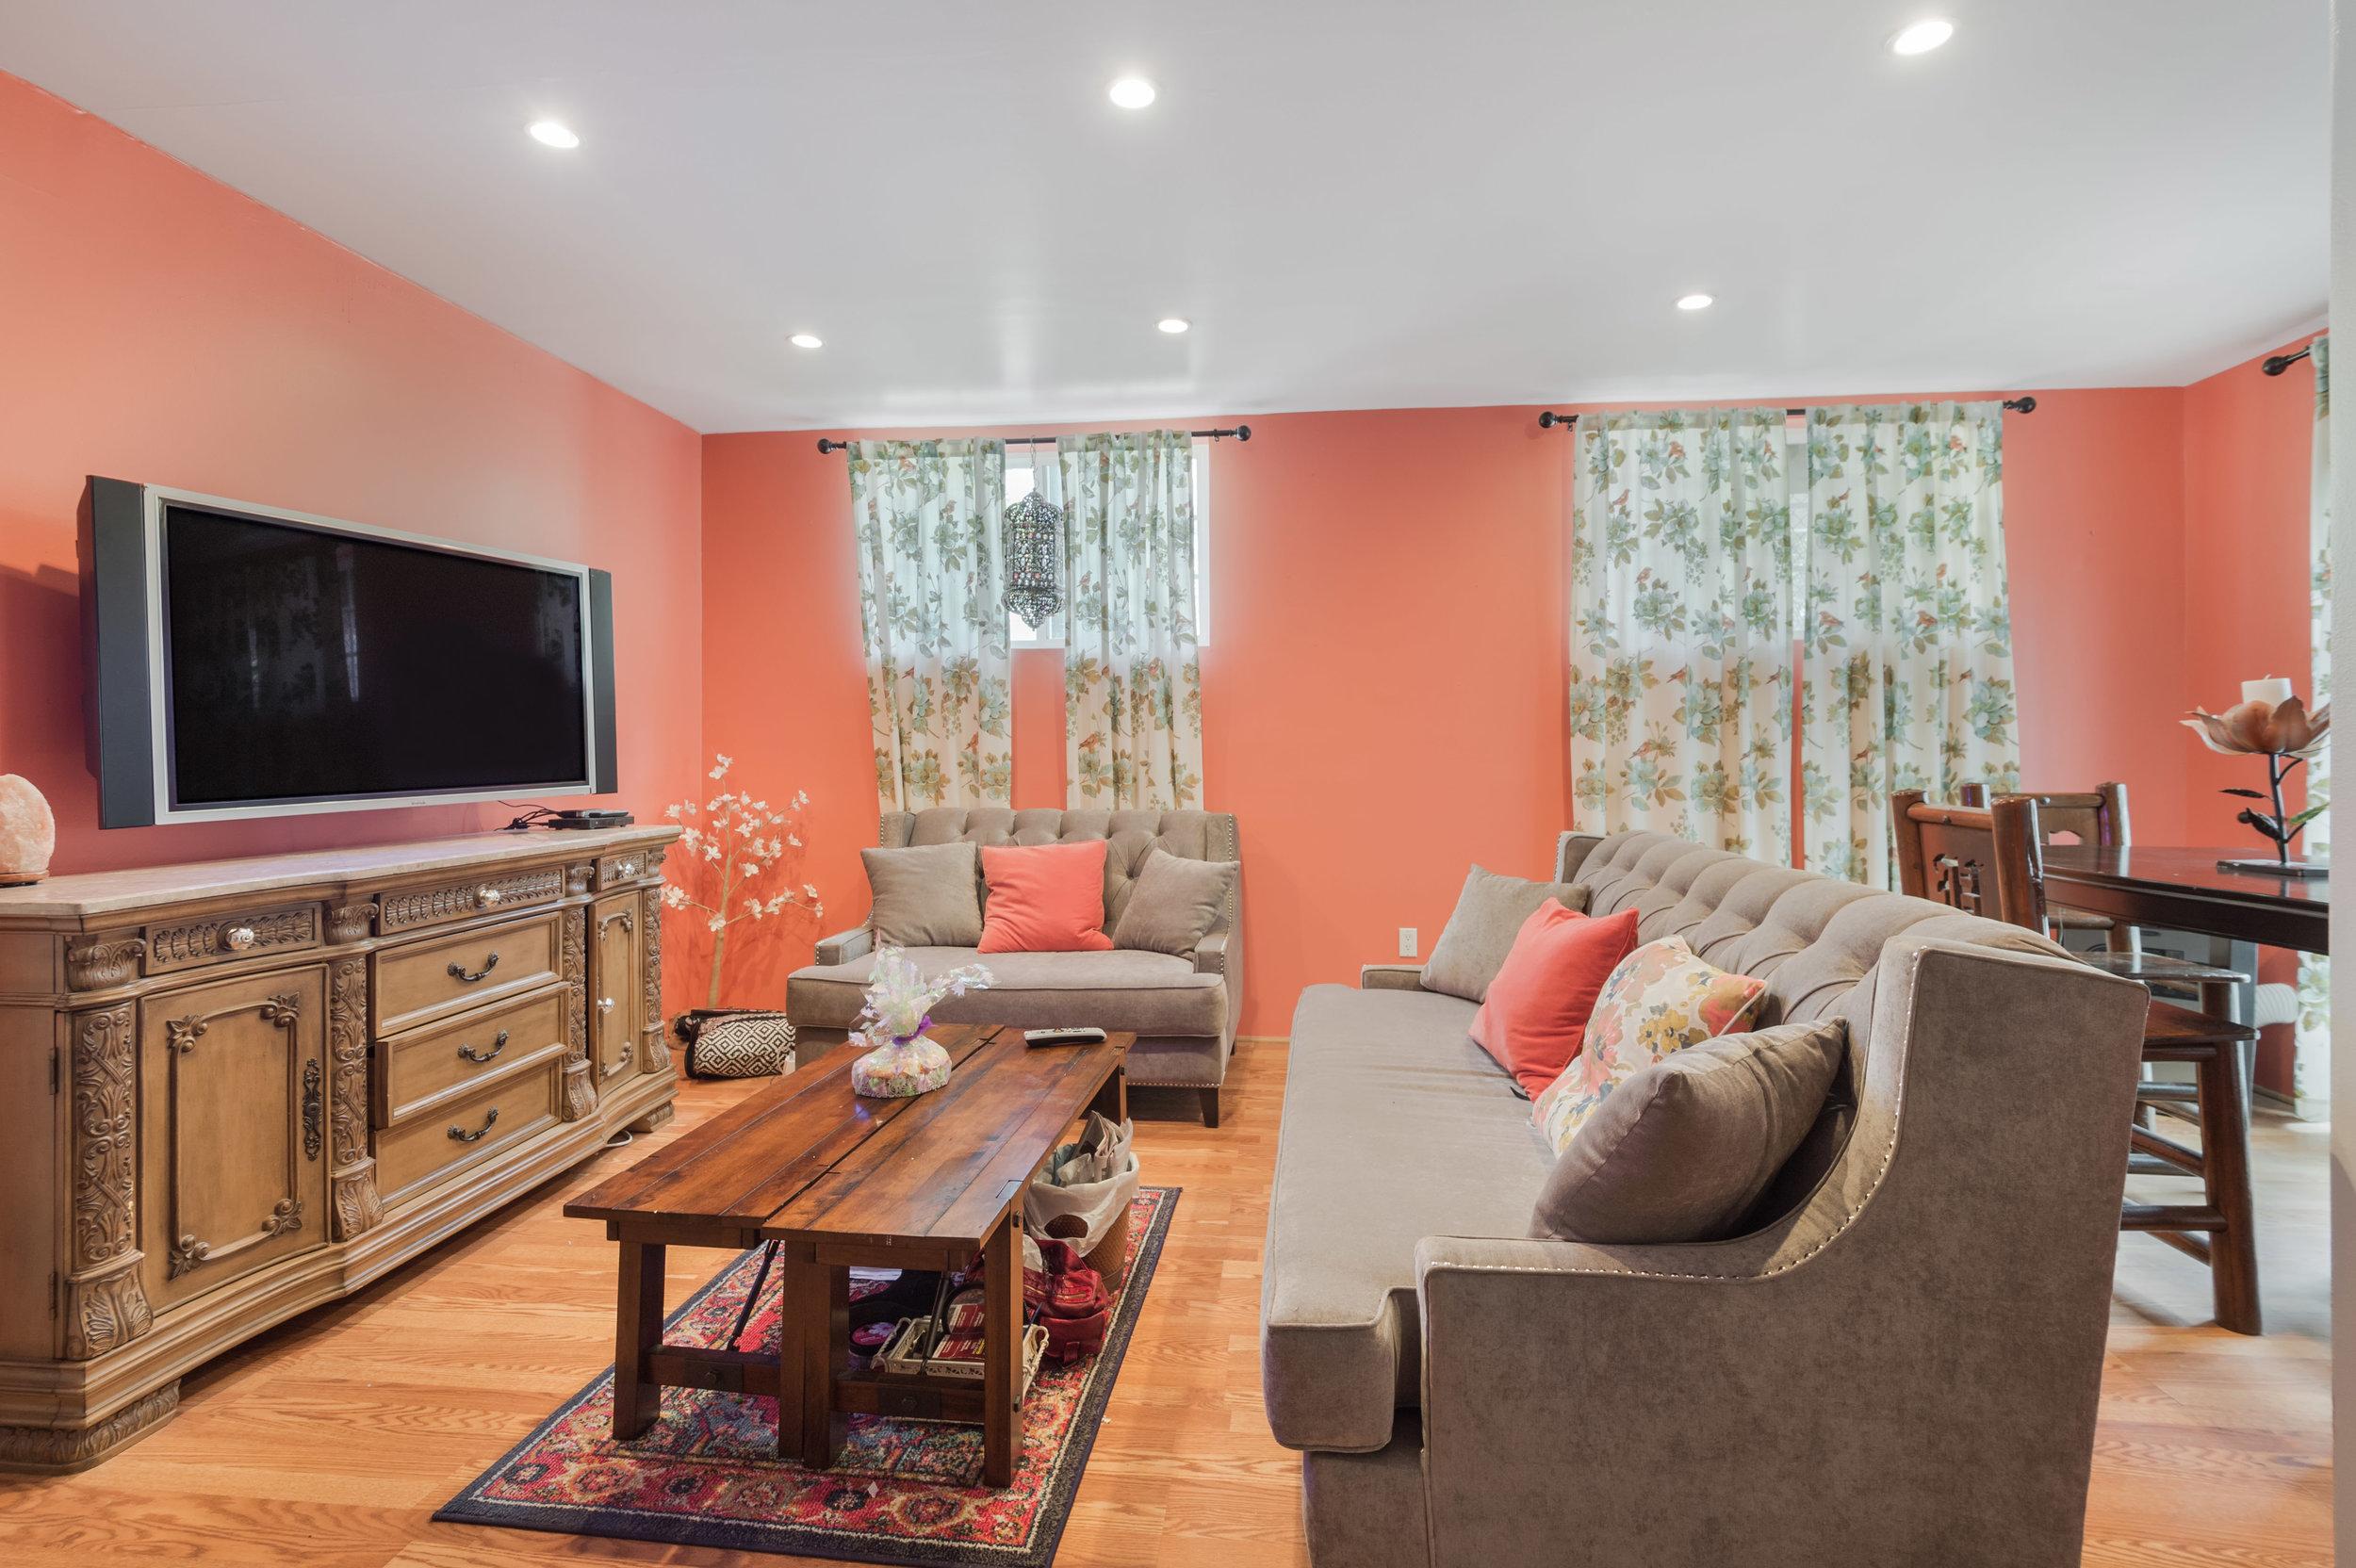 026 Guest House 006 Pool 4915 Los Feliz For Sale Los Angeles Lease The Malibu Life Team Luxury Real Estate.jpg